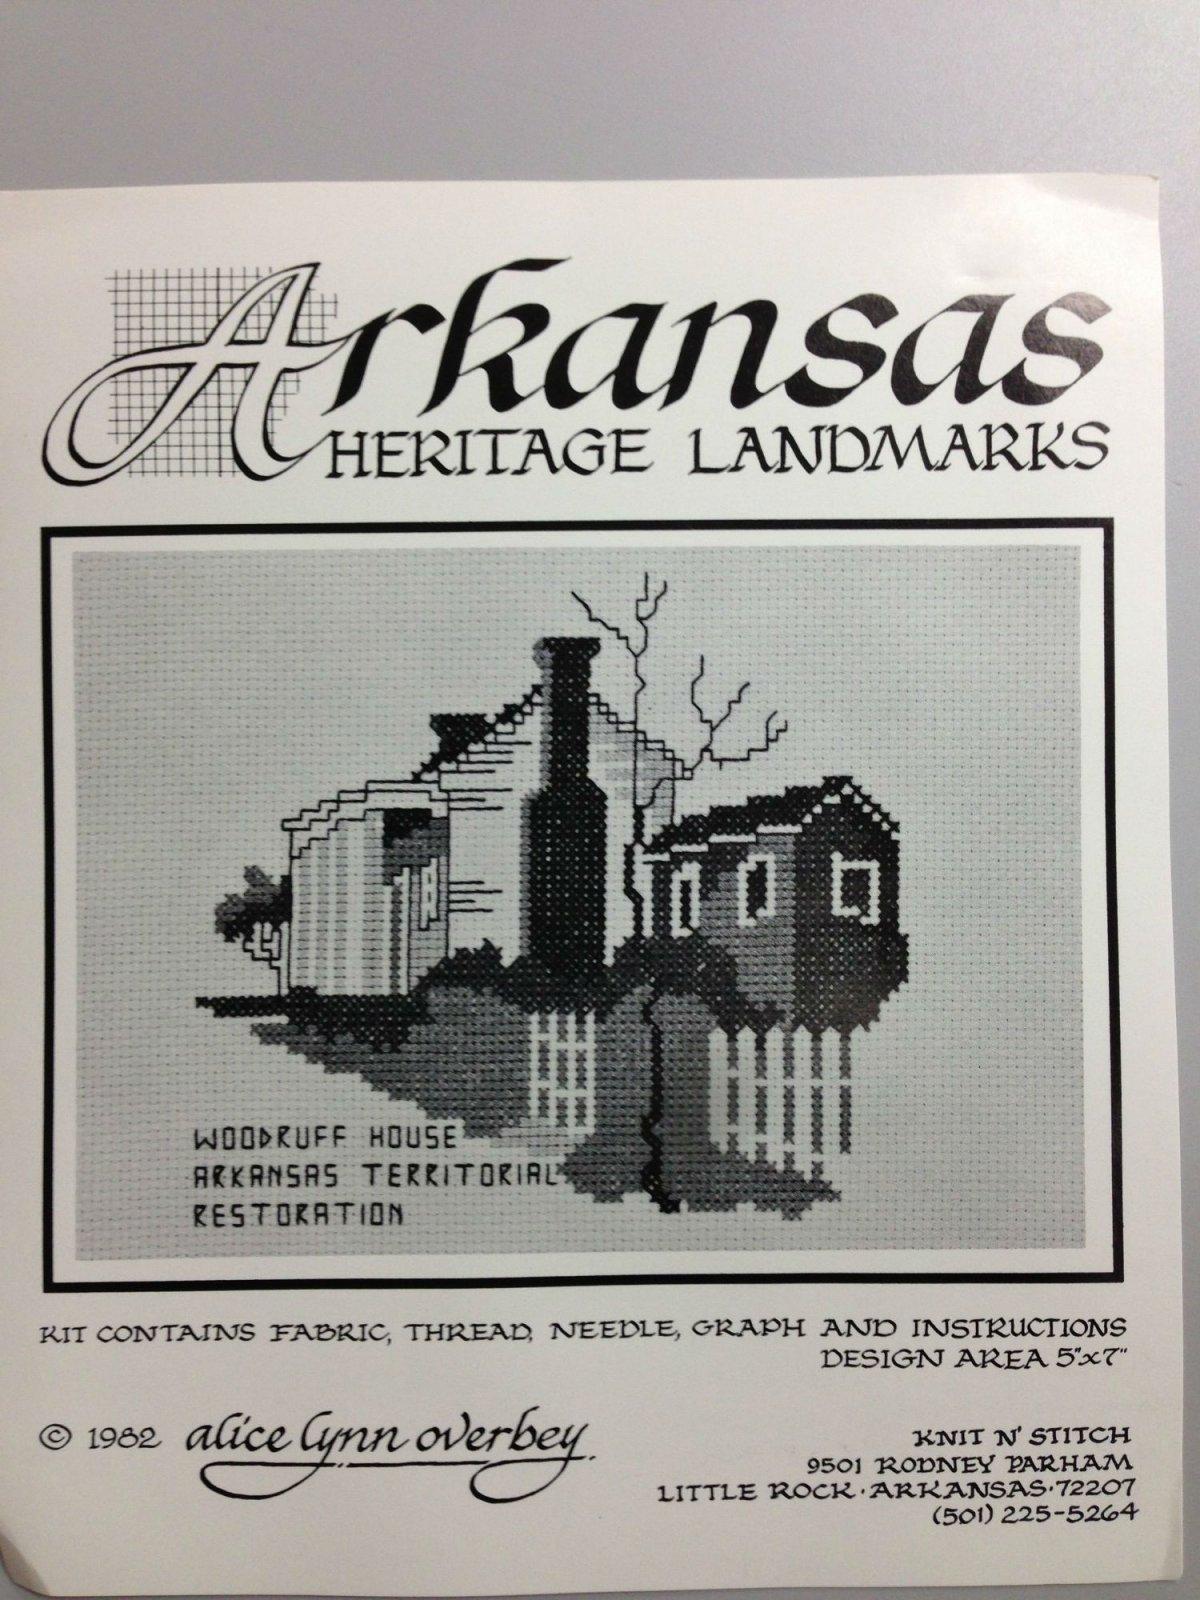 Alice Lynn Overbey Arkansas Heritage Landmarks Woodruff House Arkansas Territorial Restoration